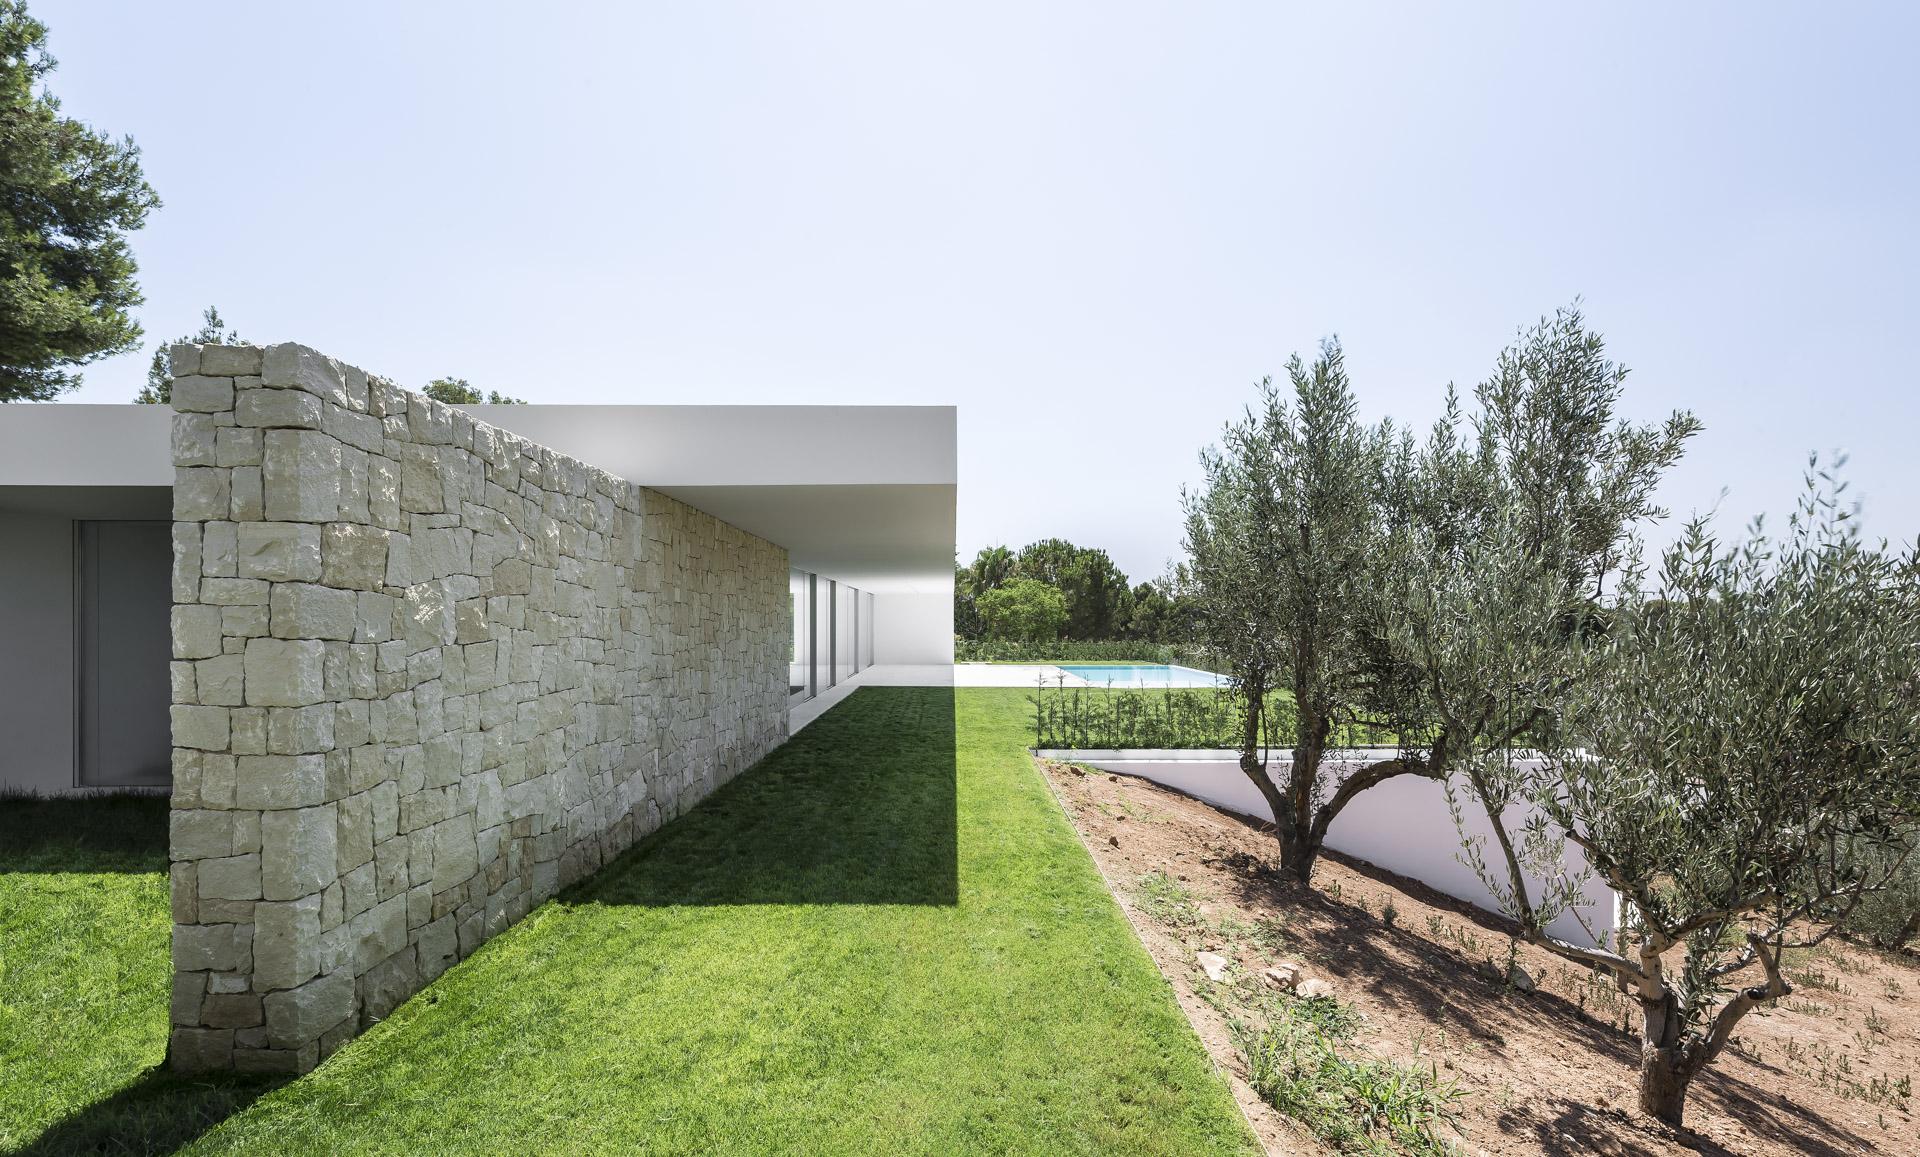 fotografia-arquitectura-valencia-german-cabo-gallardo-llopis-villamarchante-vivienda-13